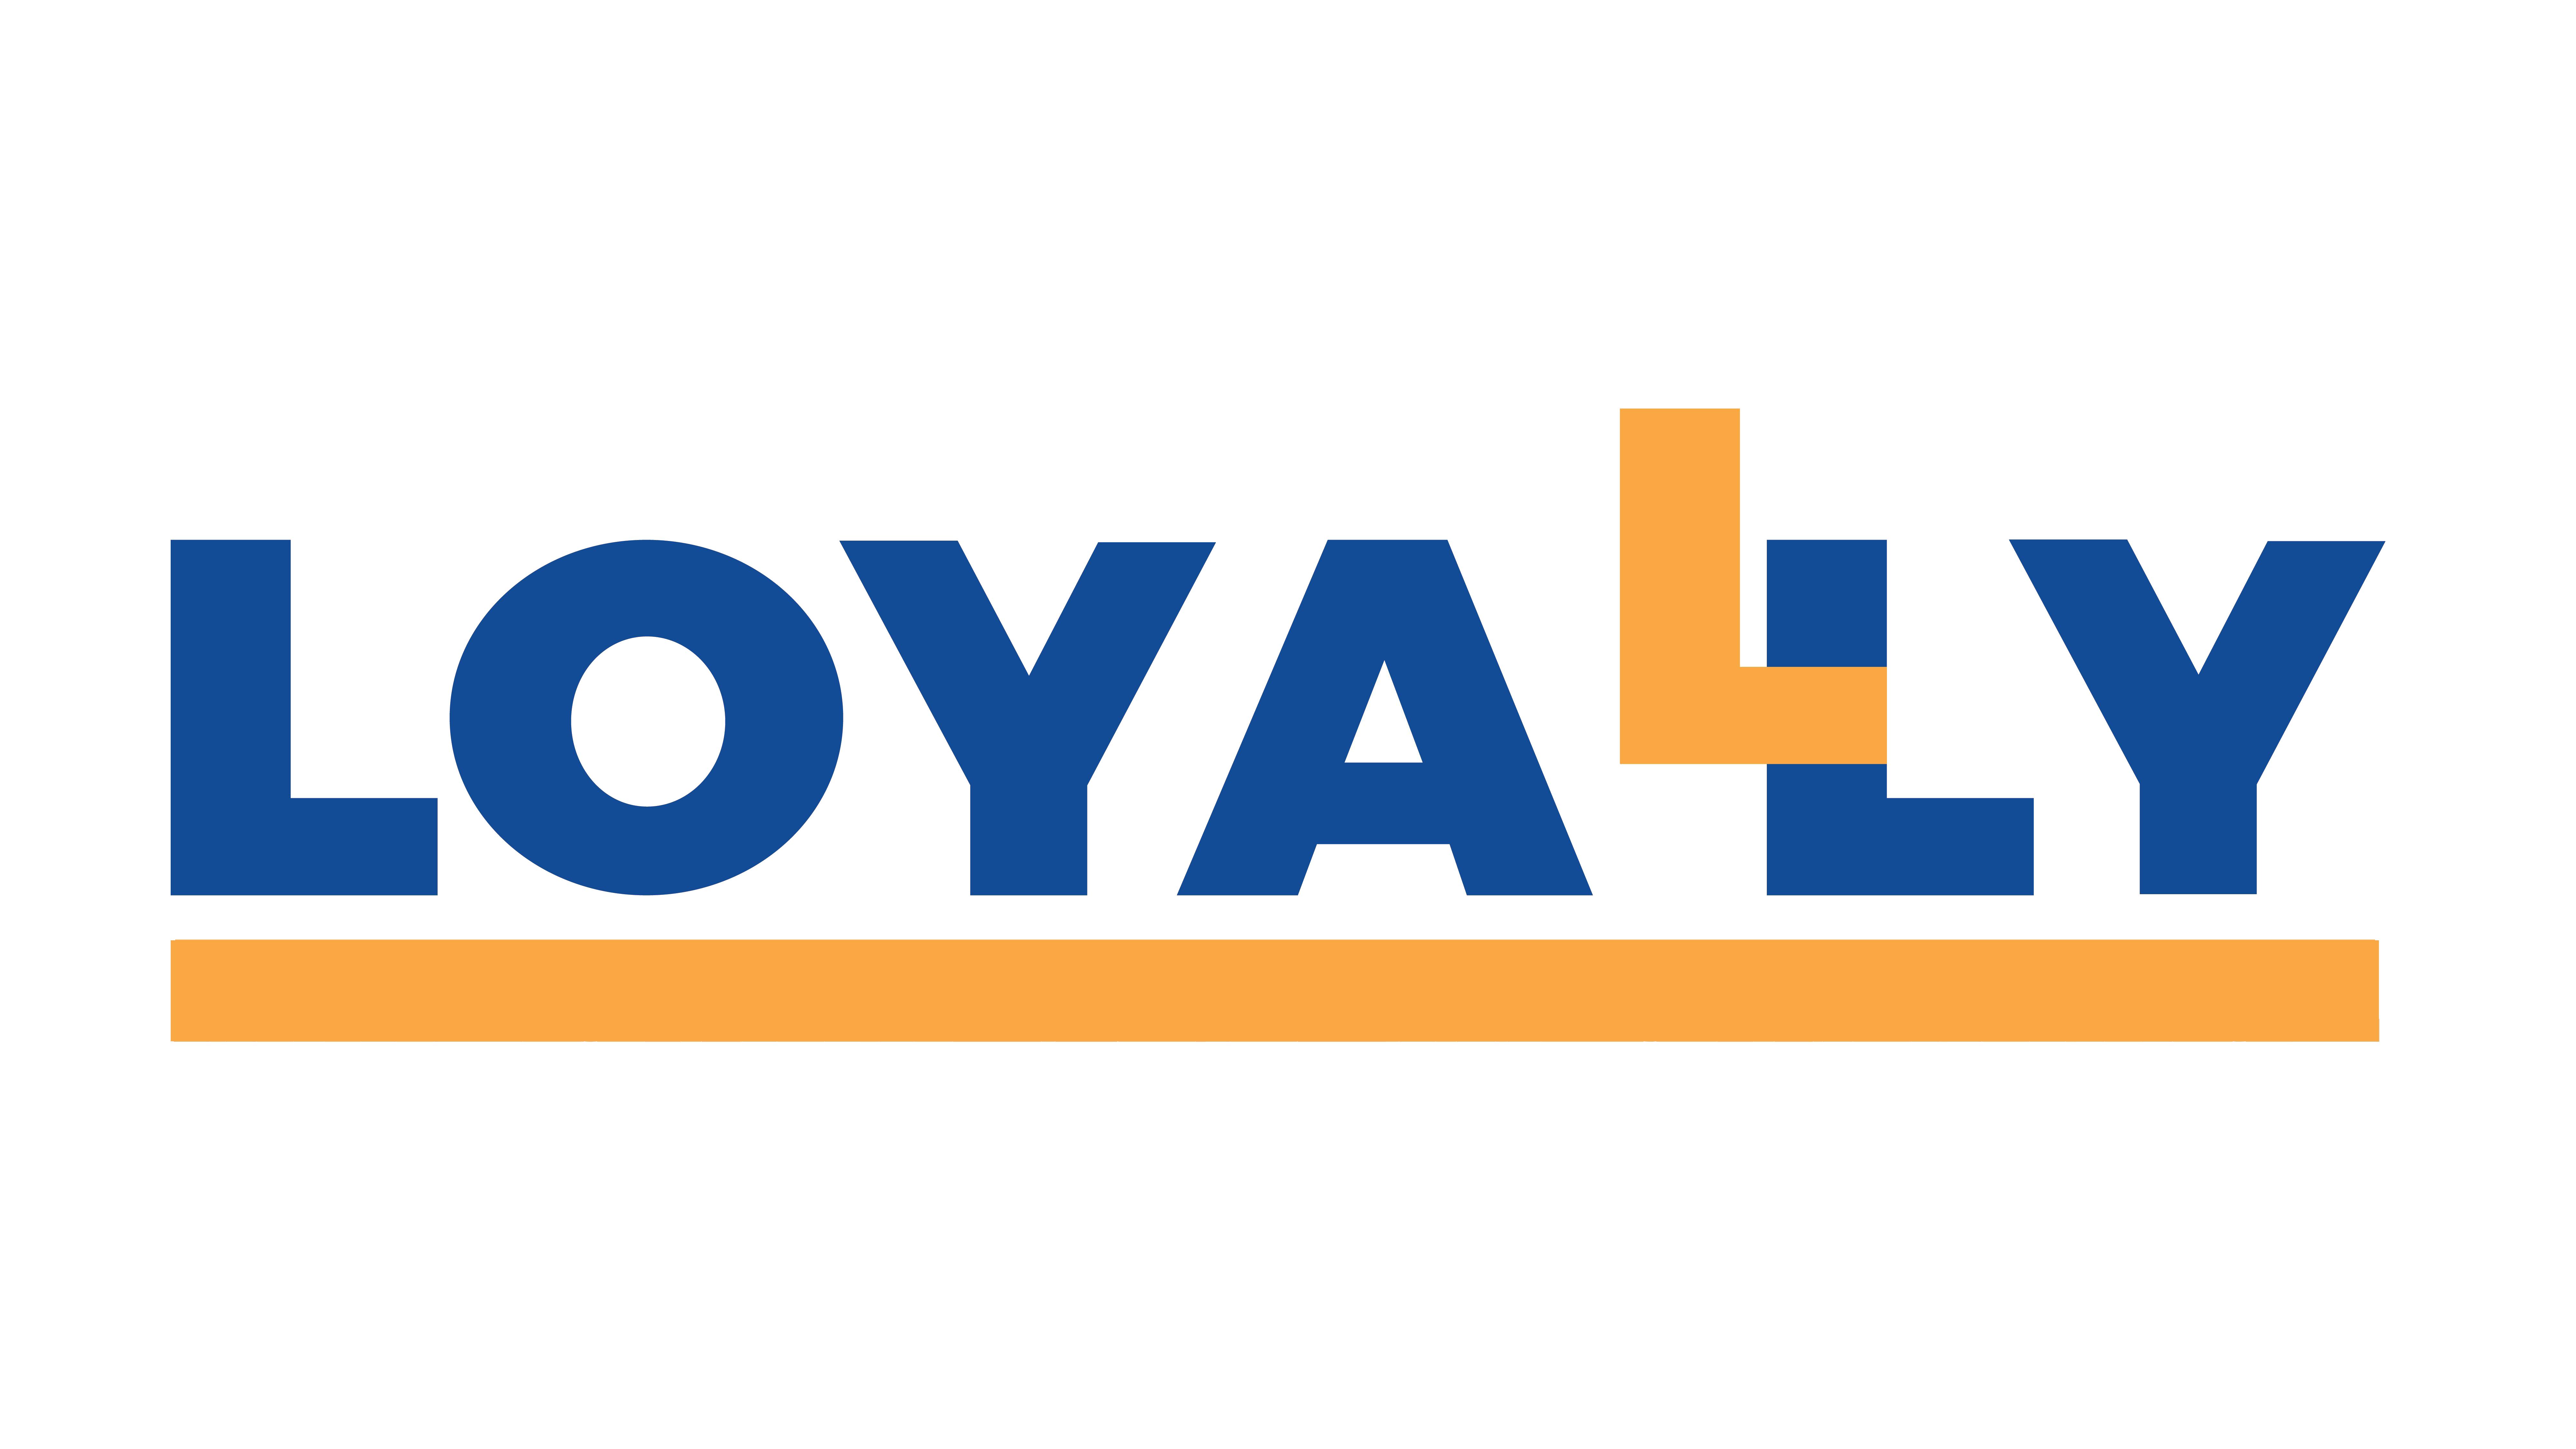 Loyally